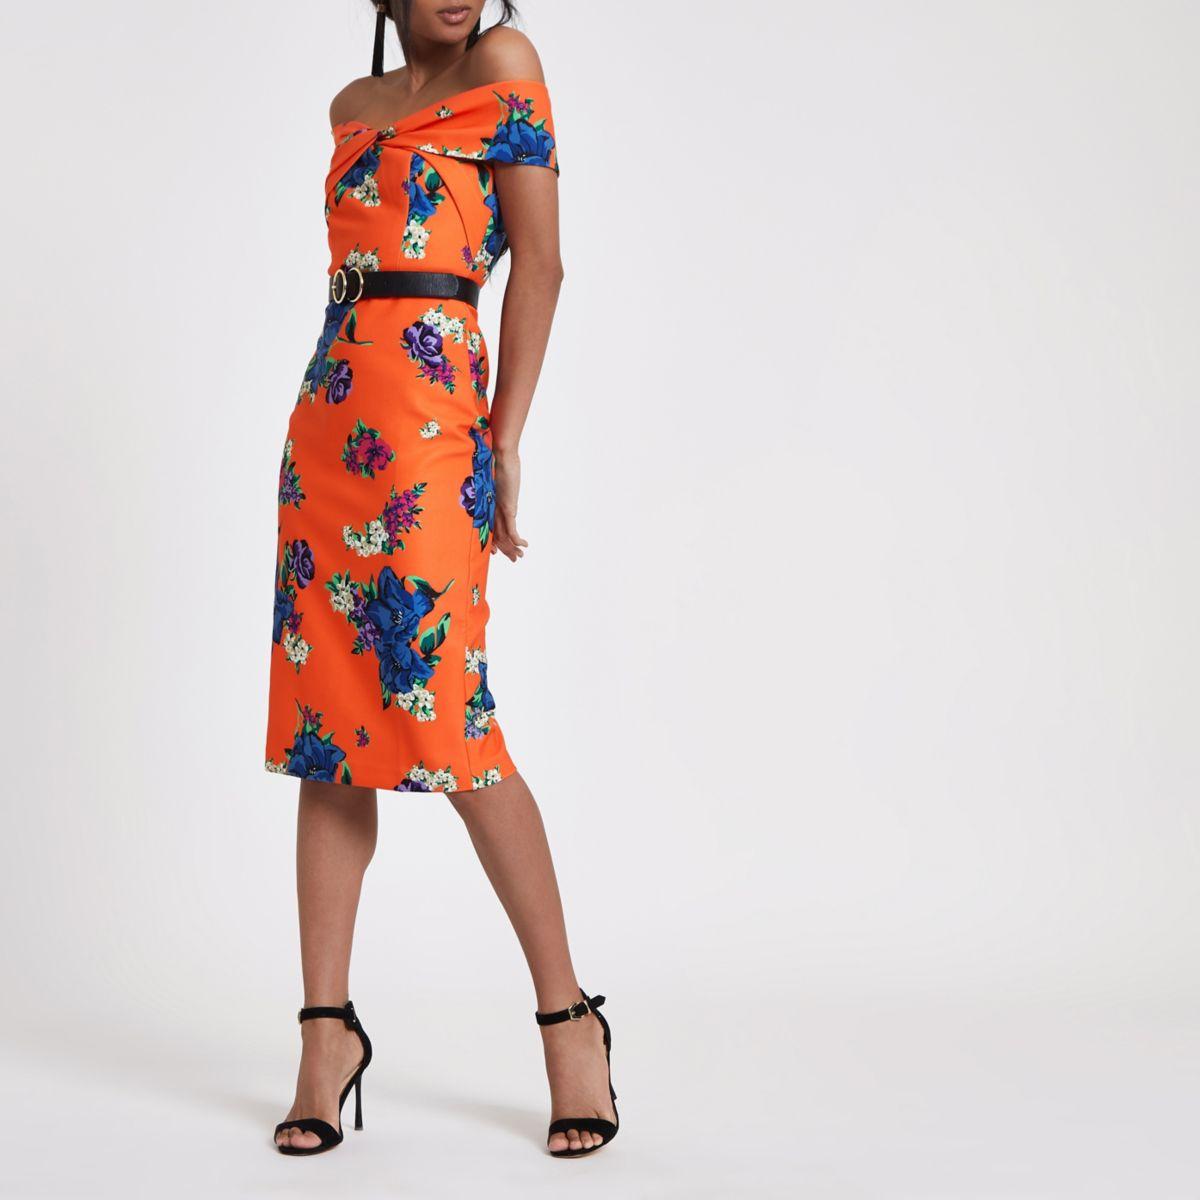 Orange floral twist front bodycon midi dress